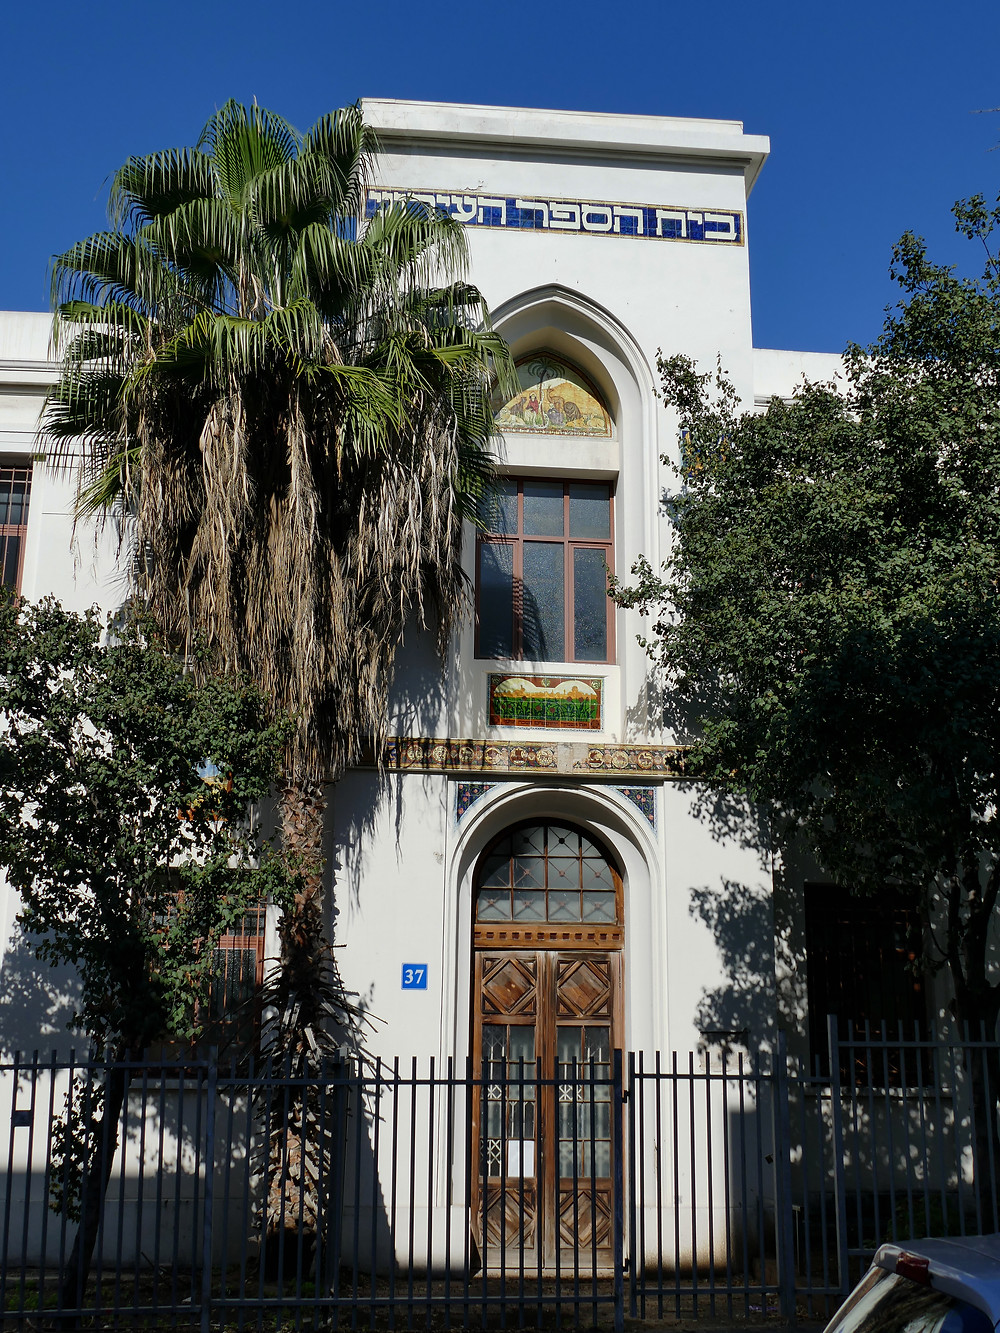 Eingangsportal der Ahad Ha'am Schule